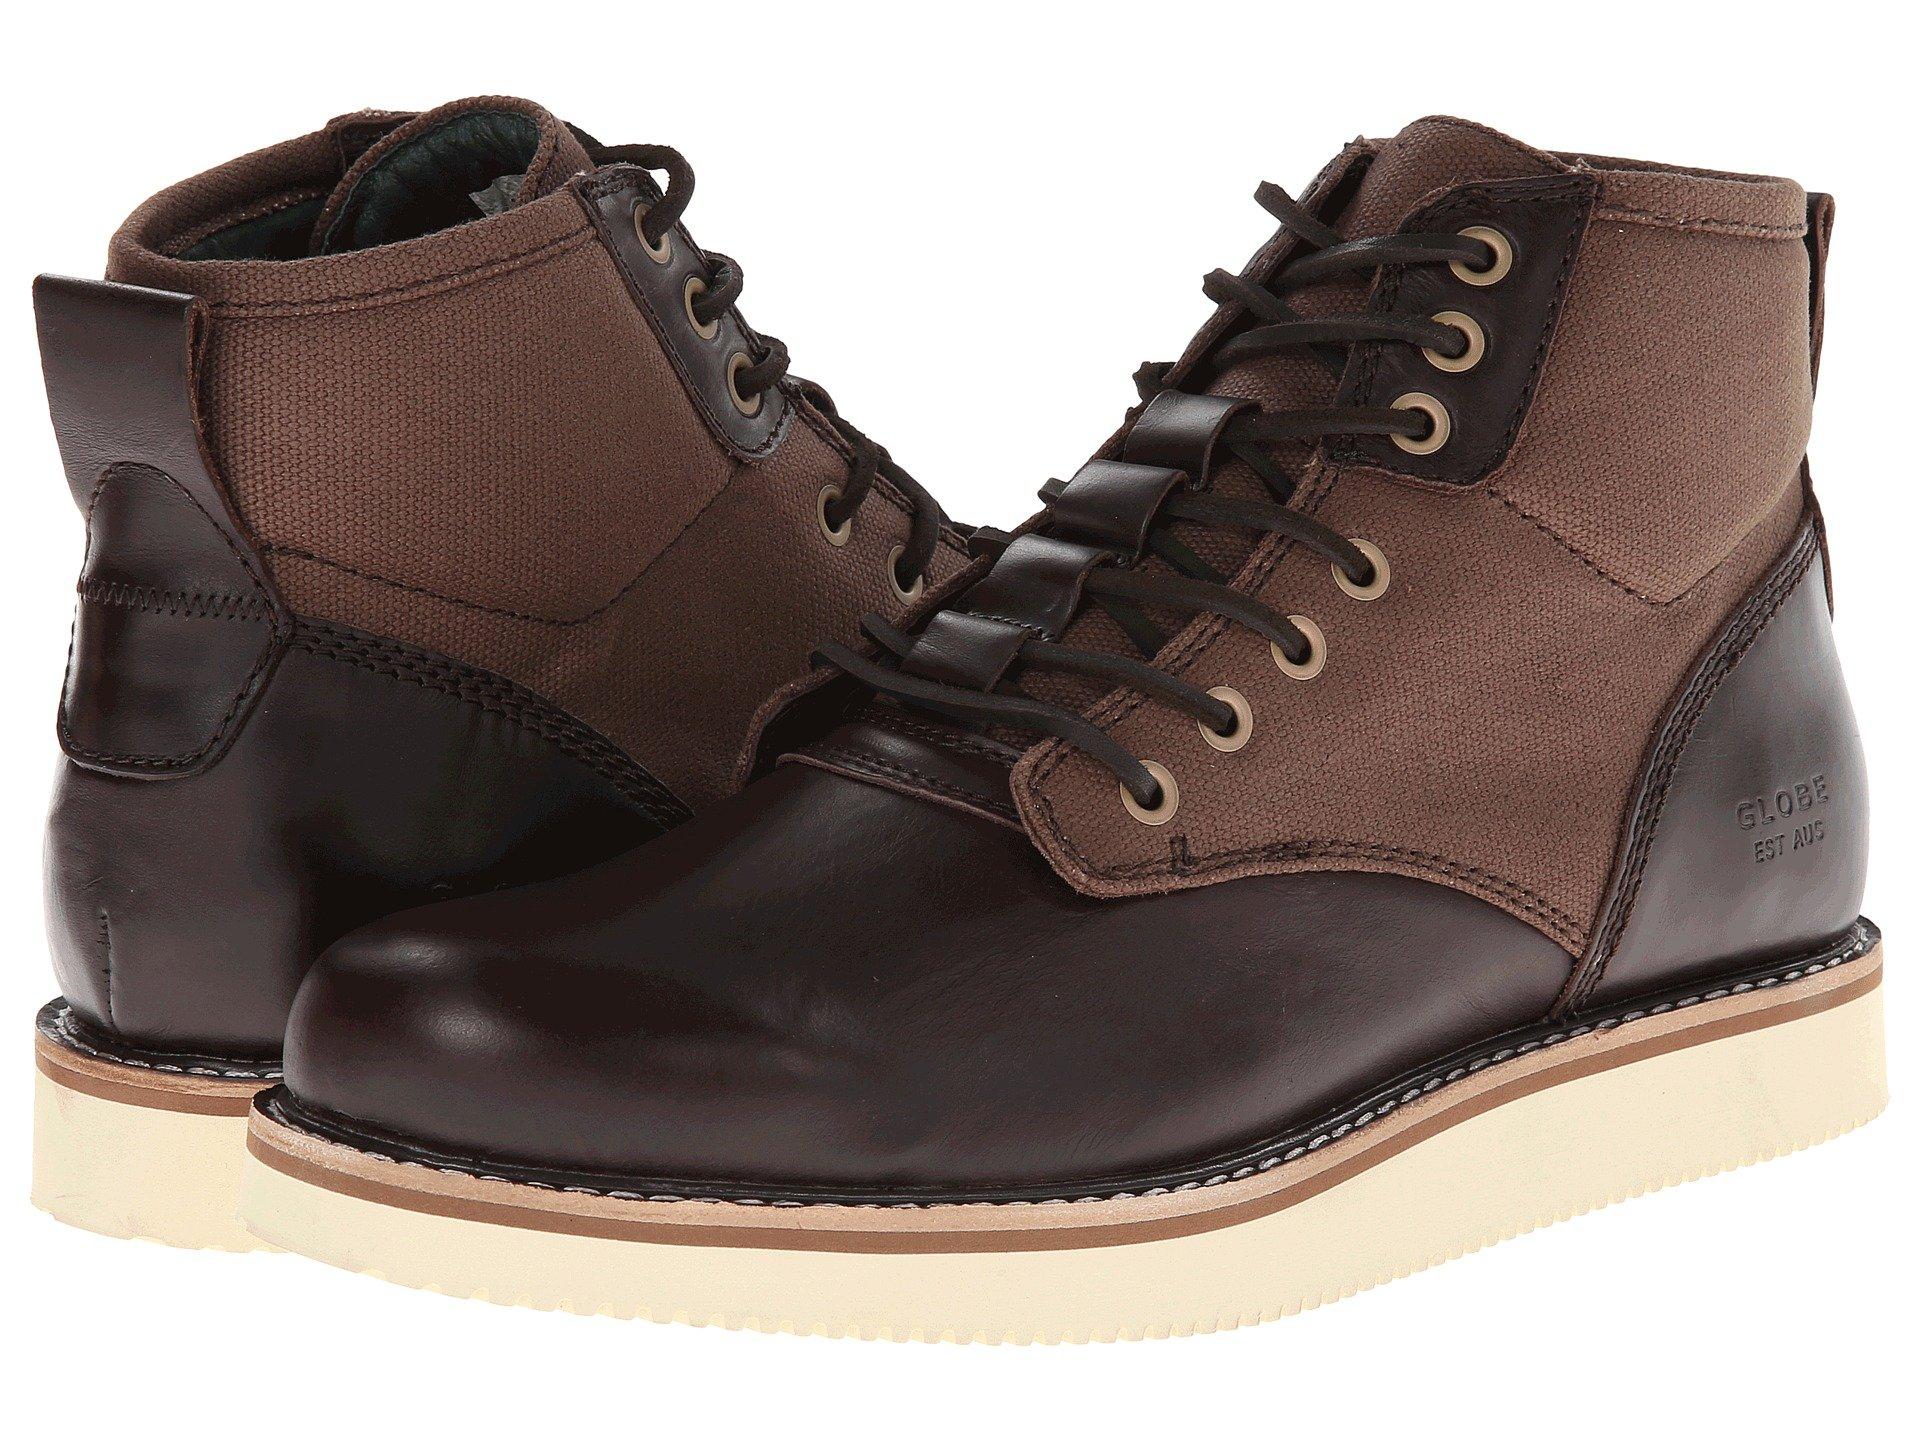 406865011b42 Men's Black Nomad Boot